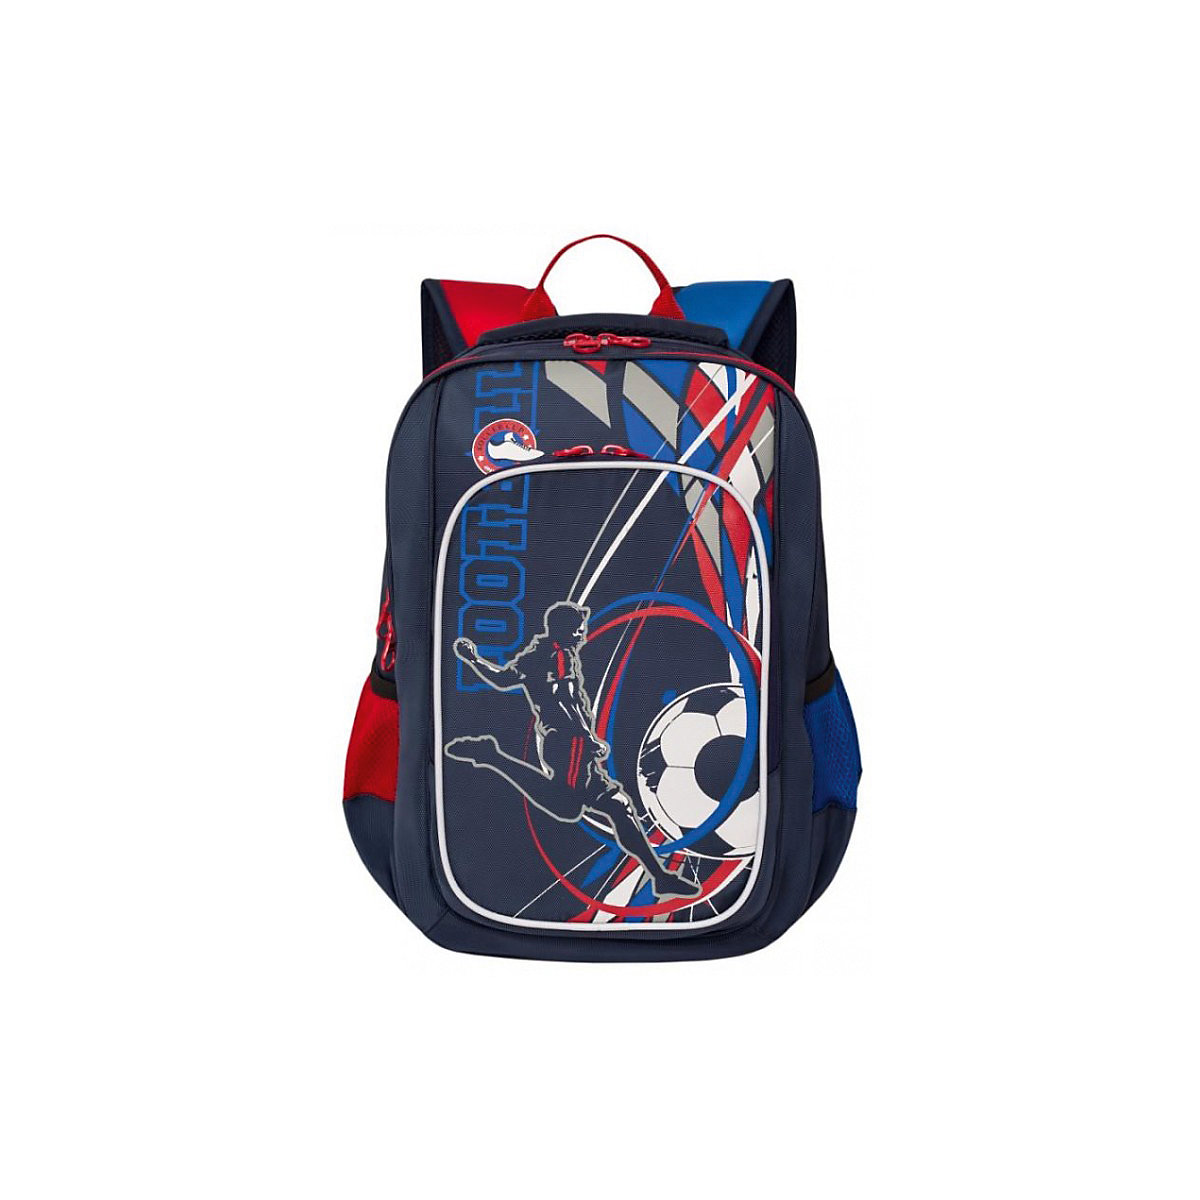 Фото - School Bags GRIZZLY 8333838 schoolbag backpack orthopedic bag for boy and girl animals flowers cow leather tote bag brand 2018 bolsa feminina new women handbag 100% genuine leather alligator shoulder bag free shipping